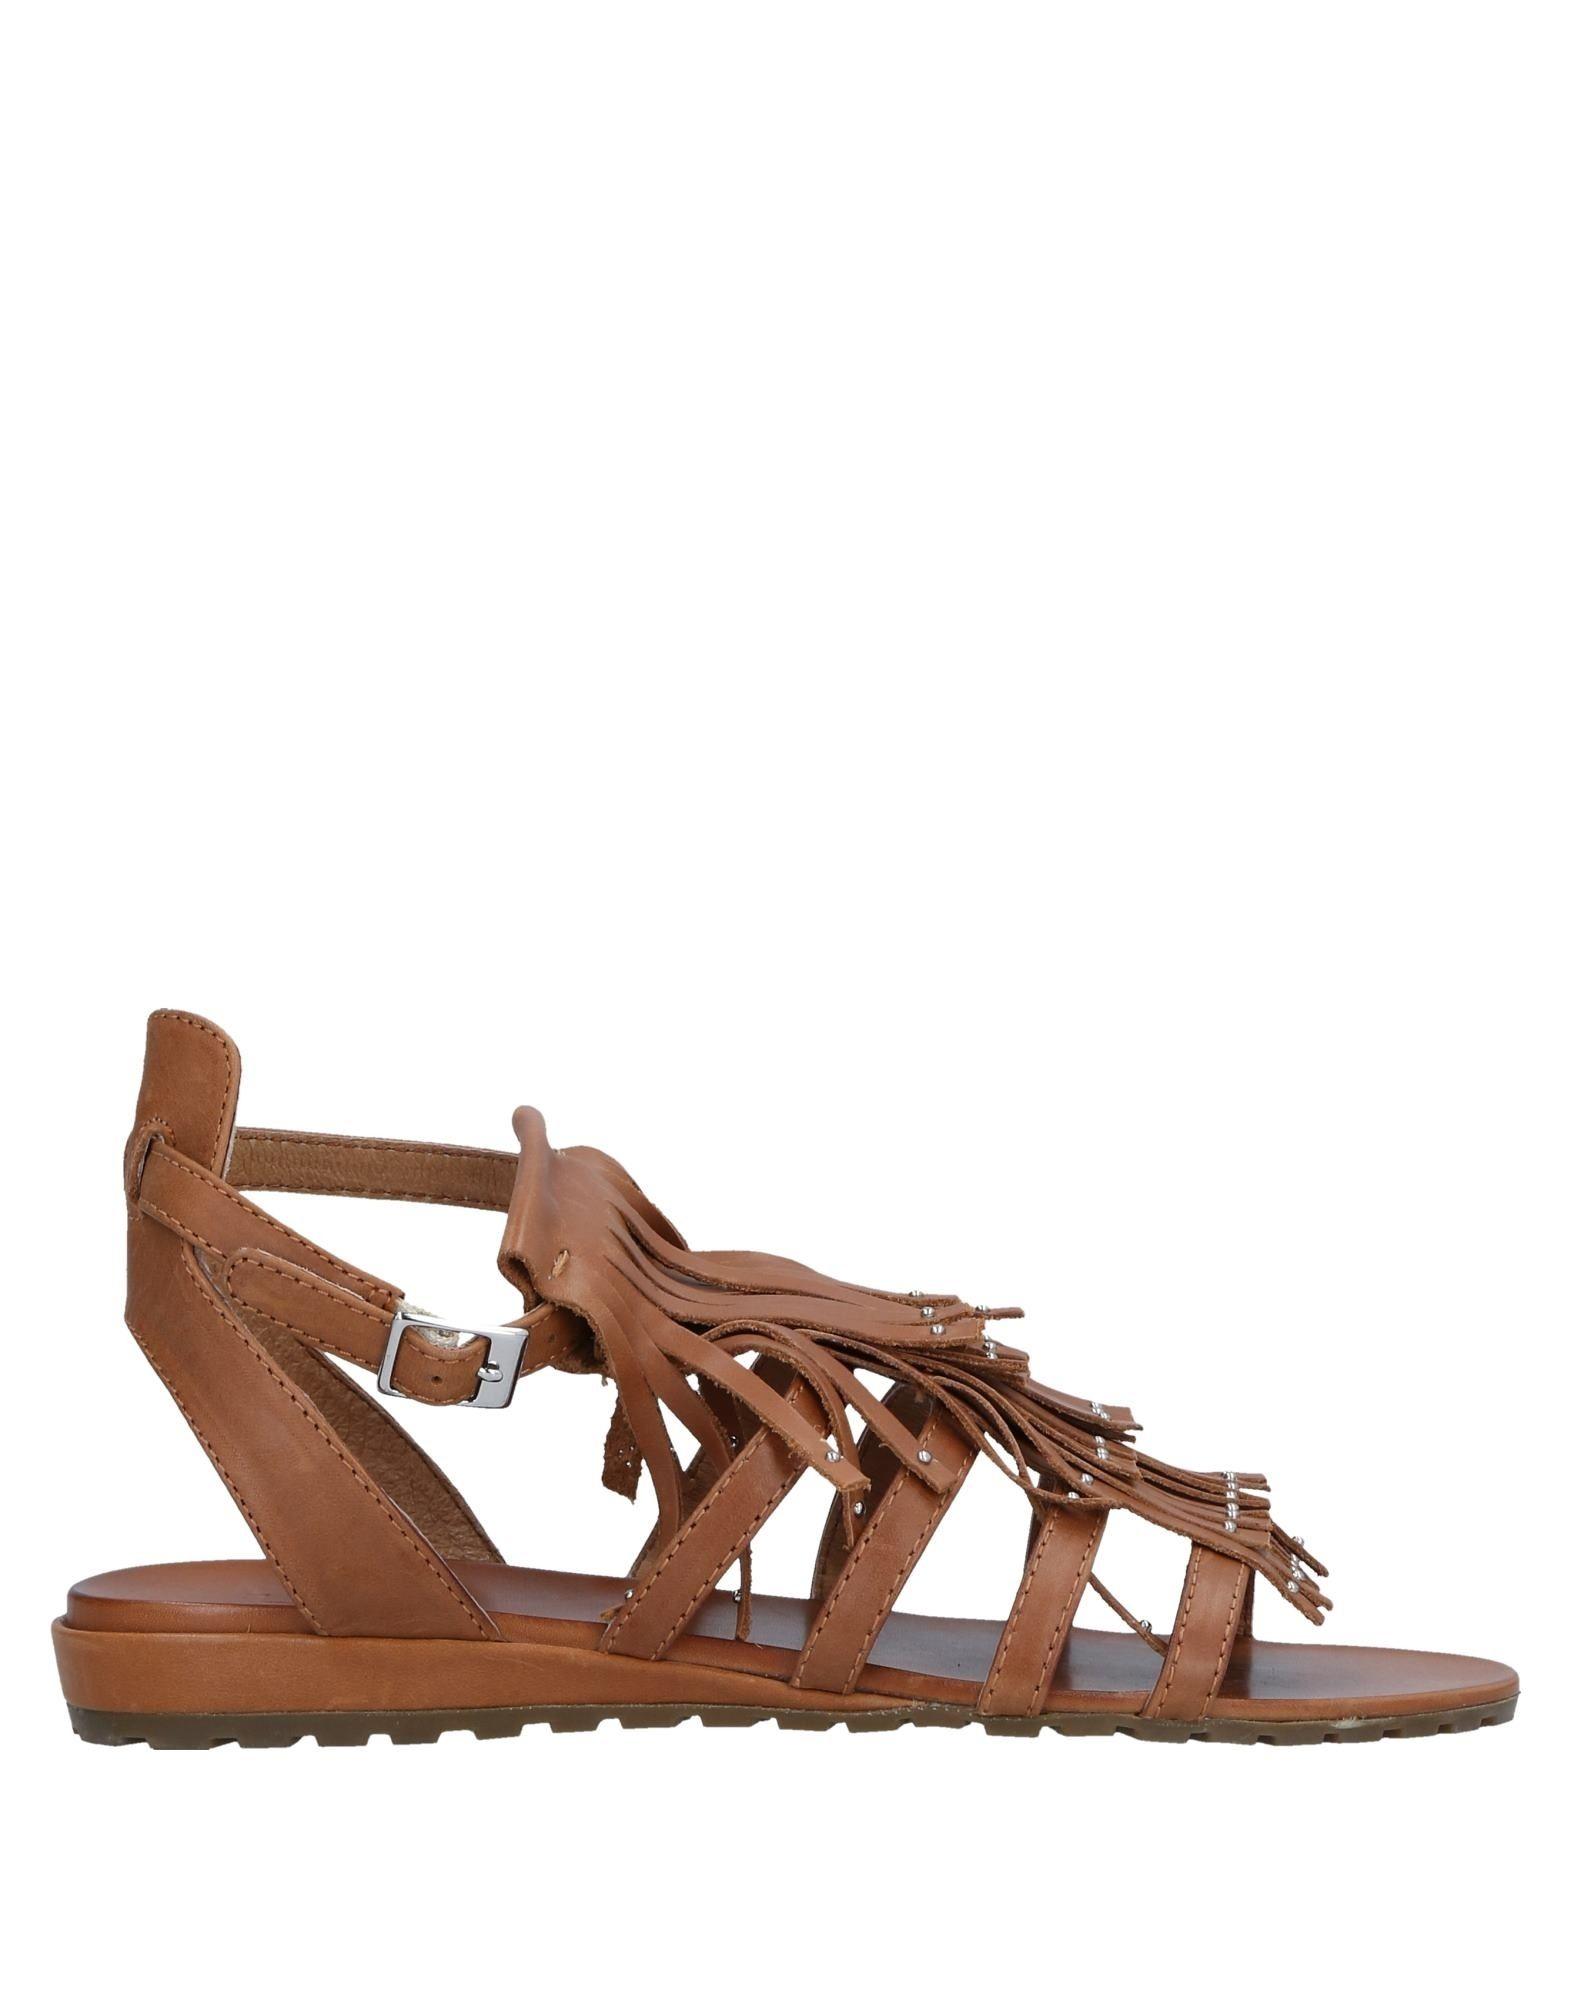 La Femme Plus Sandalen Damen  11535712TU Gute Qualität beliebte Schuhe